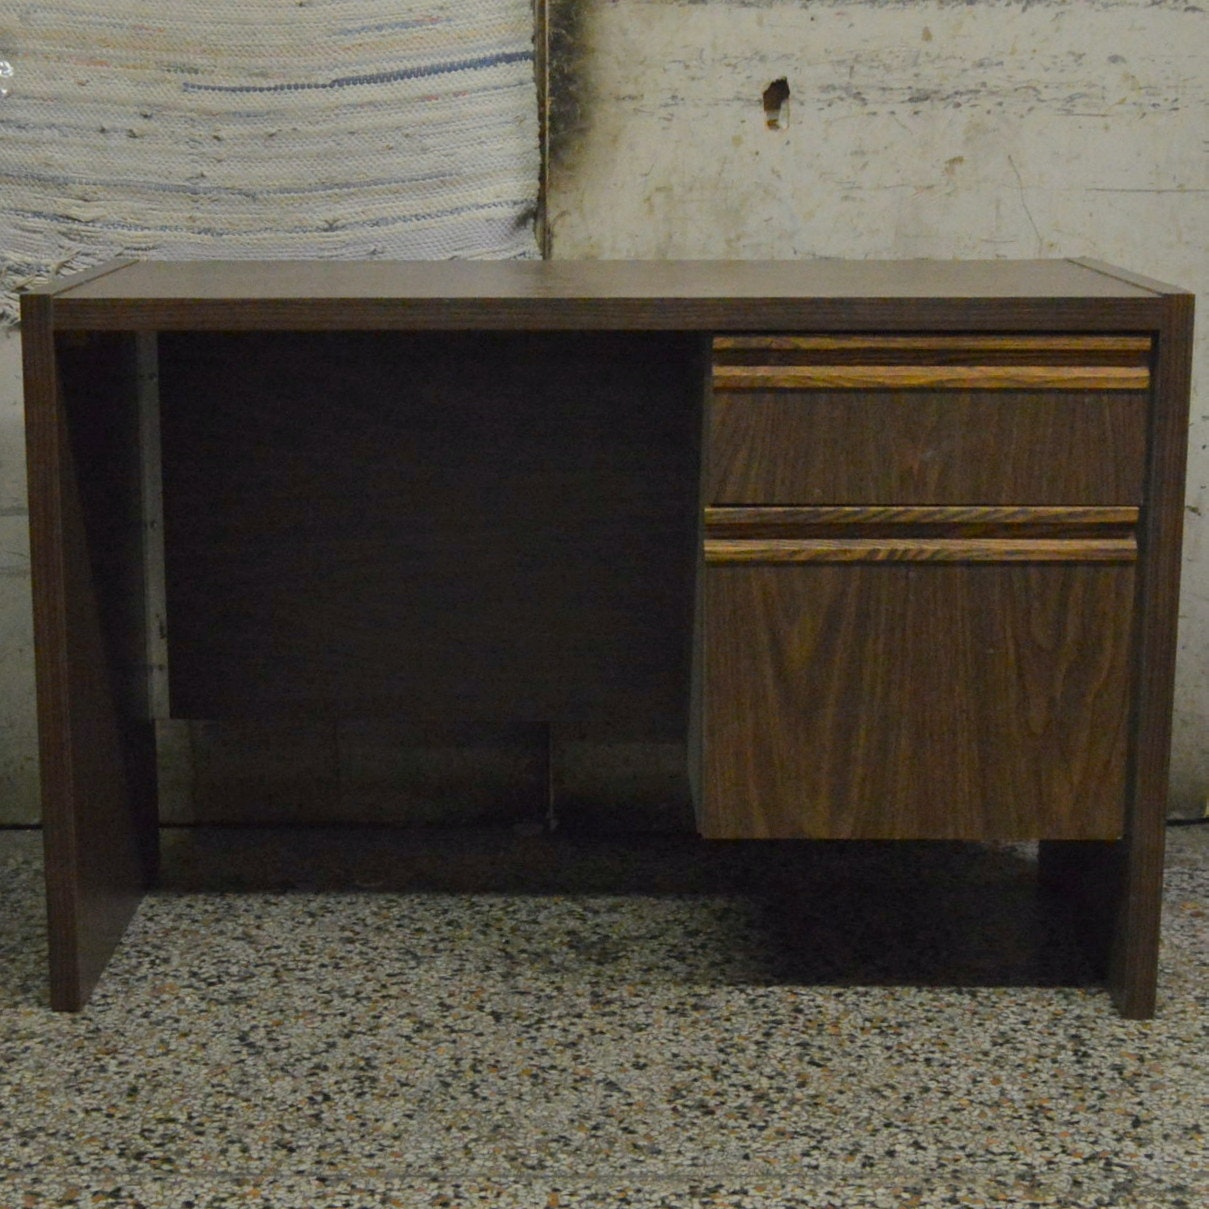 Laminated Walnut-Toned Desk